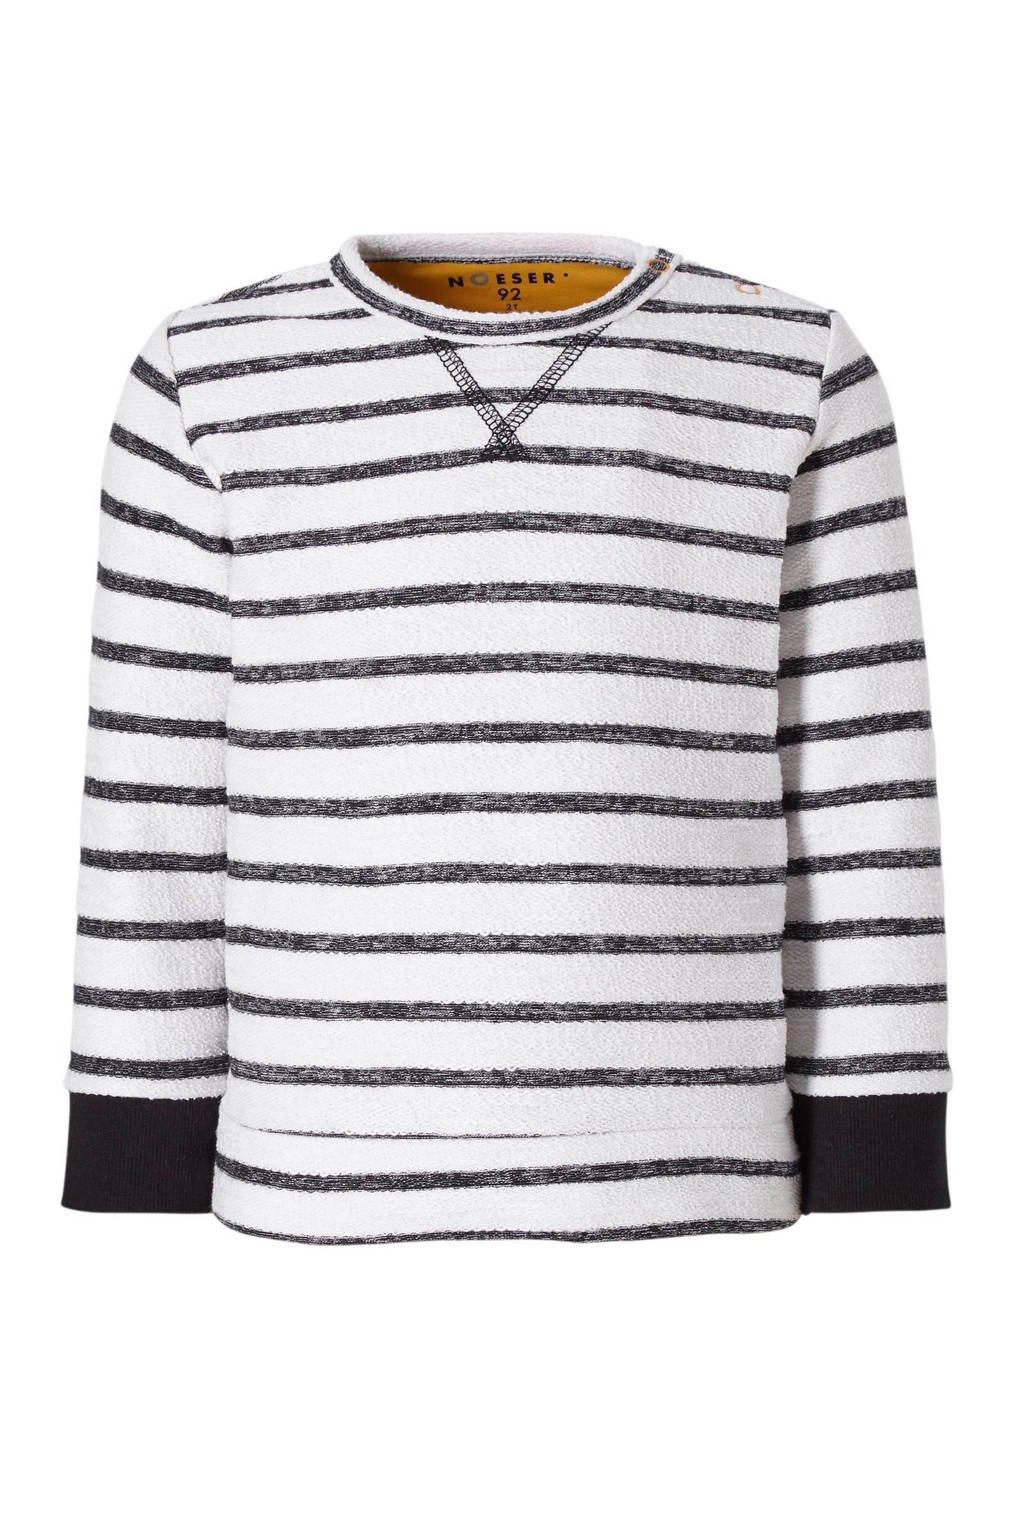 nOeser gestreepte sweater Lana wit/zwart, Wit/zwart